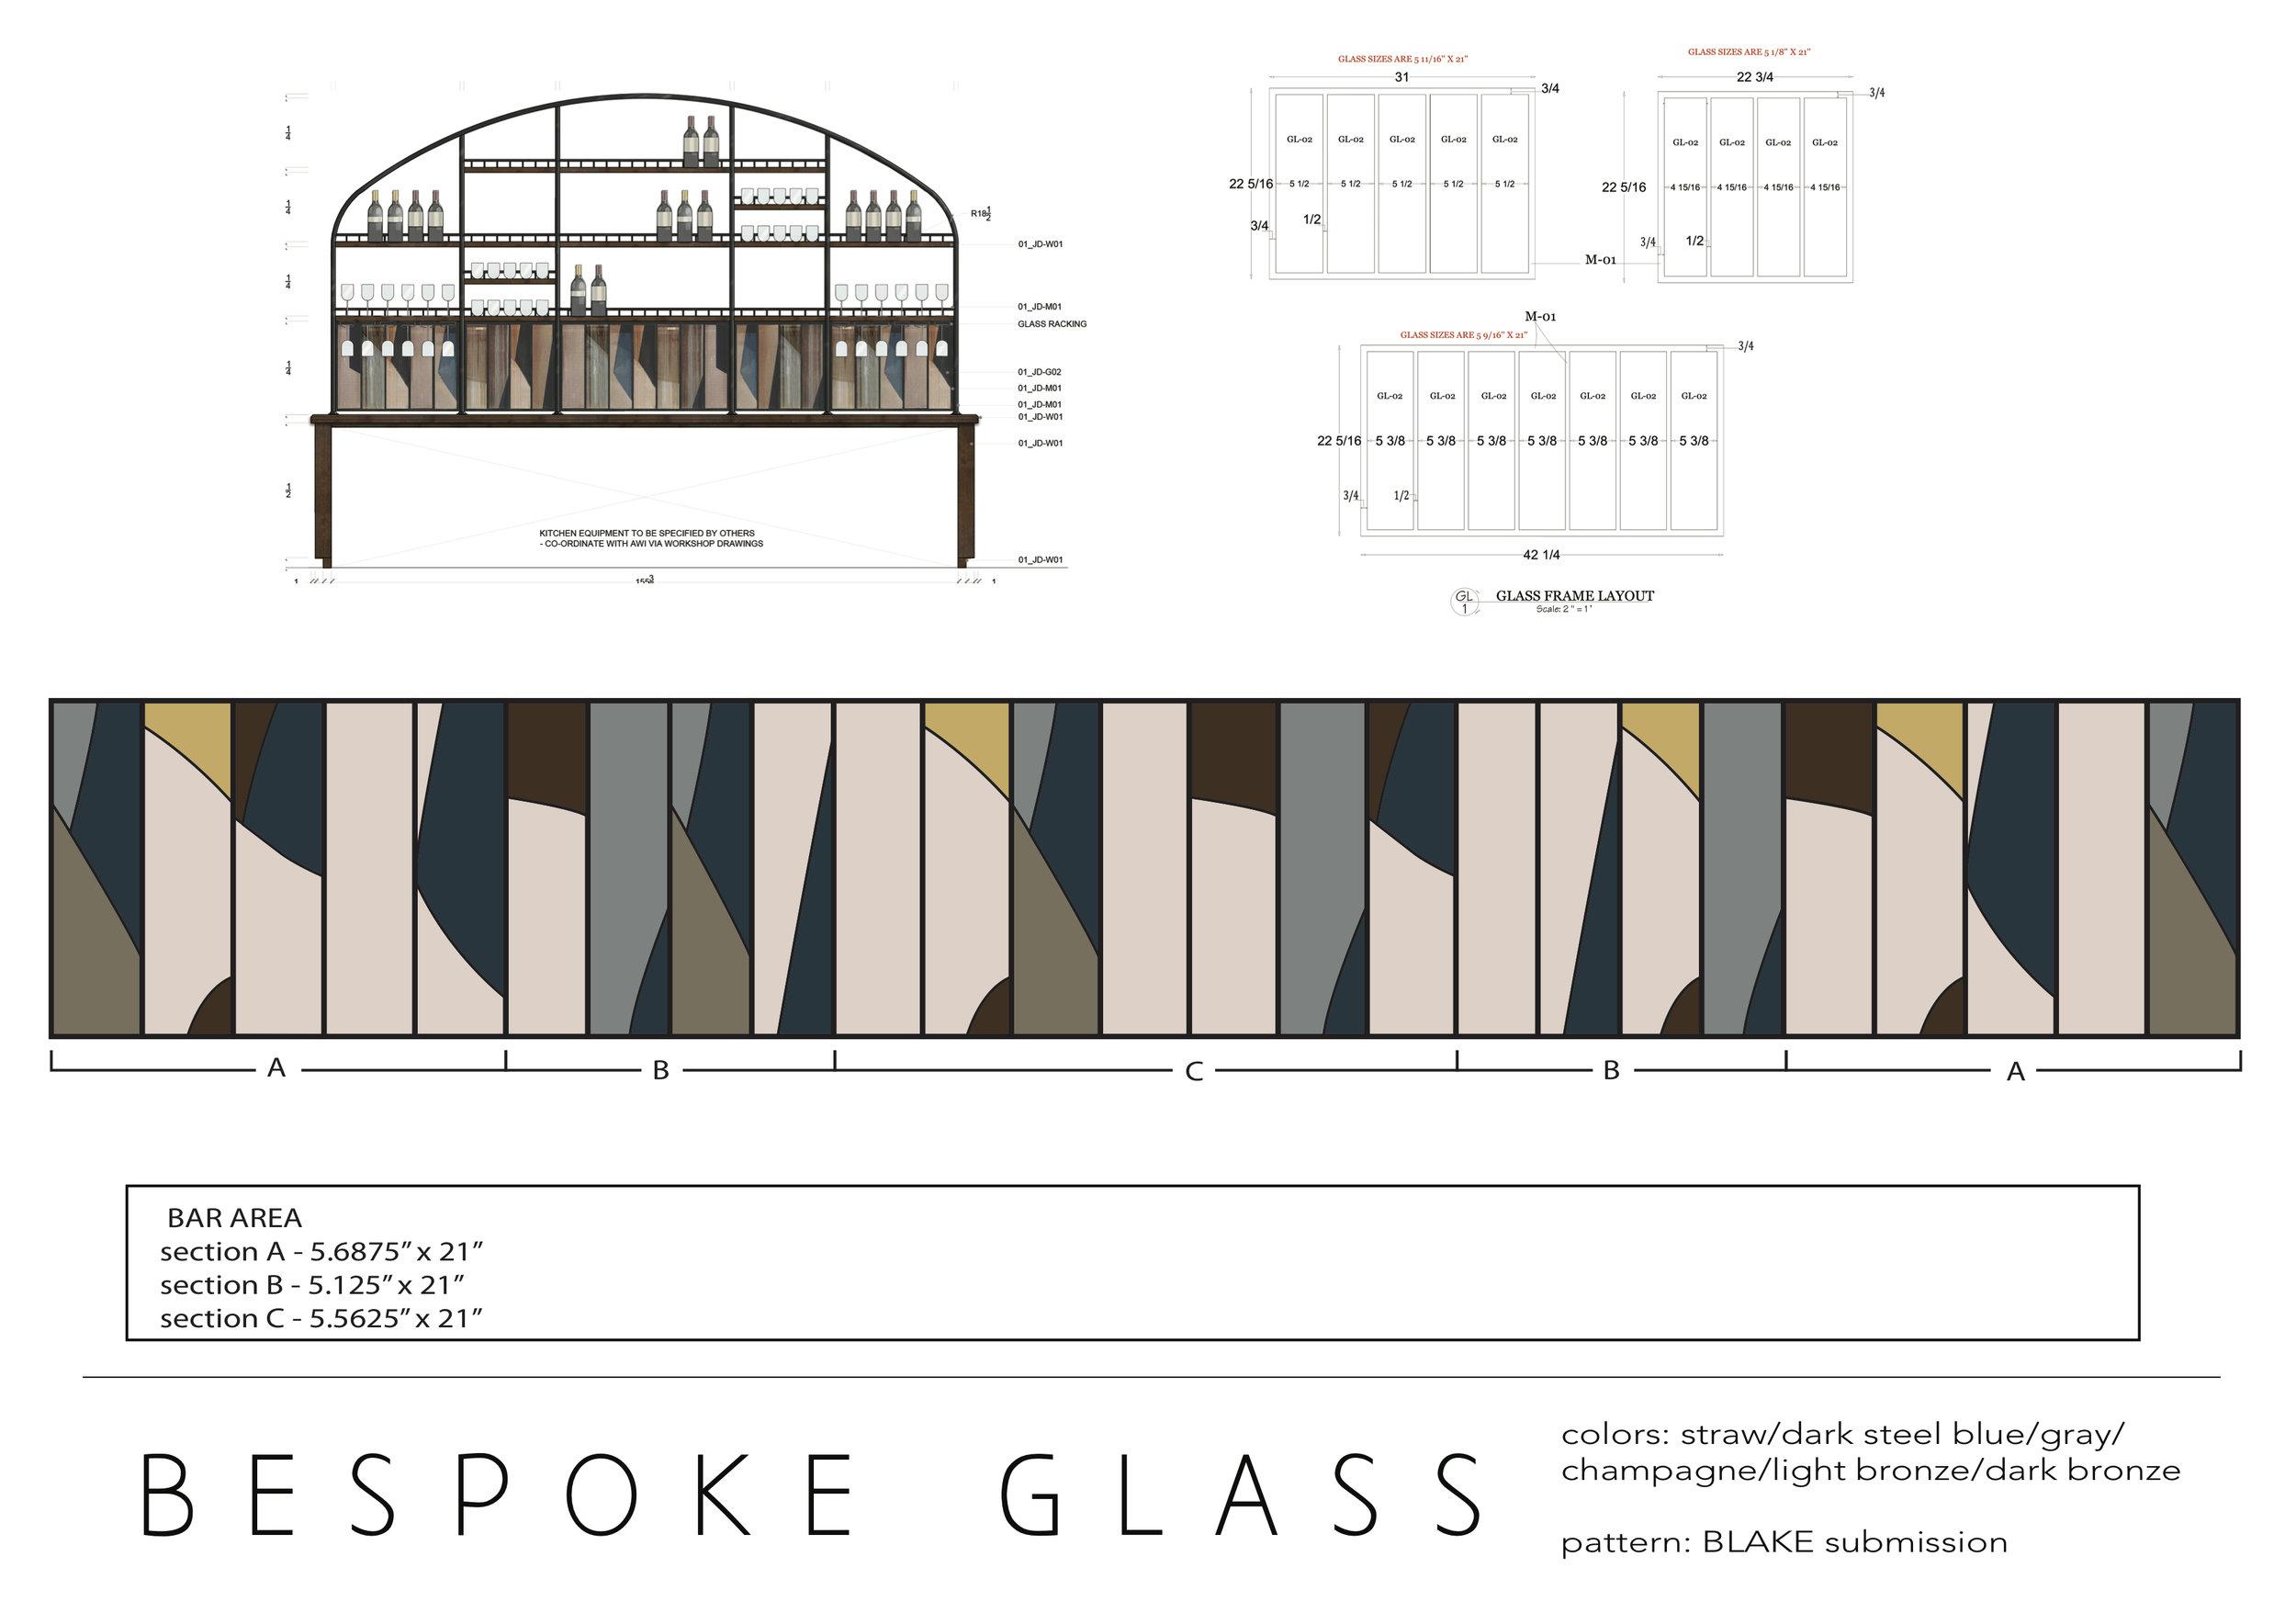 Design Layout/bar area